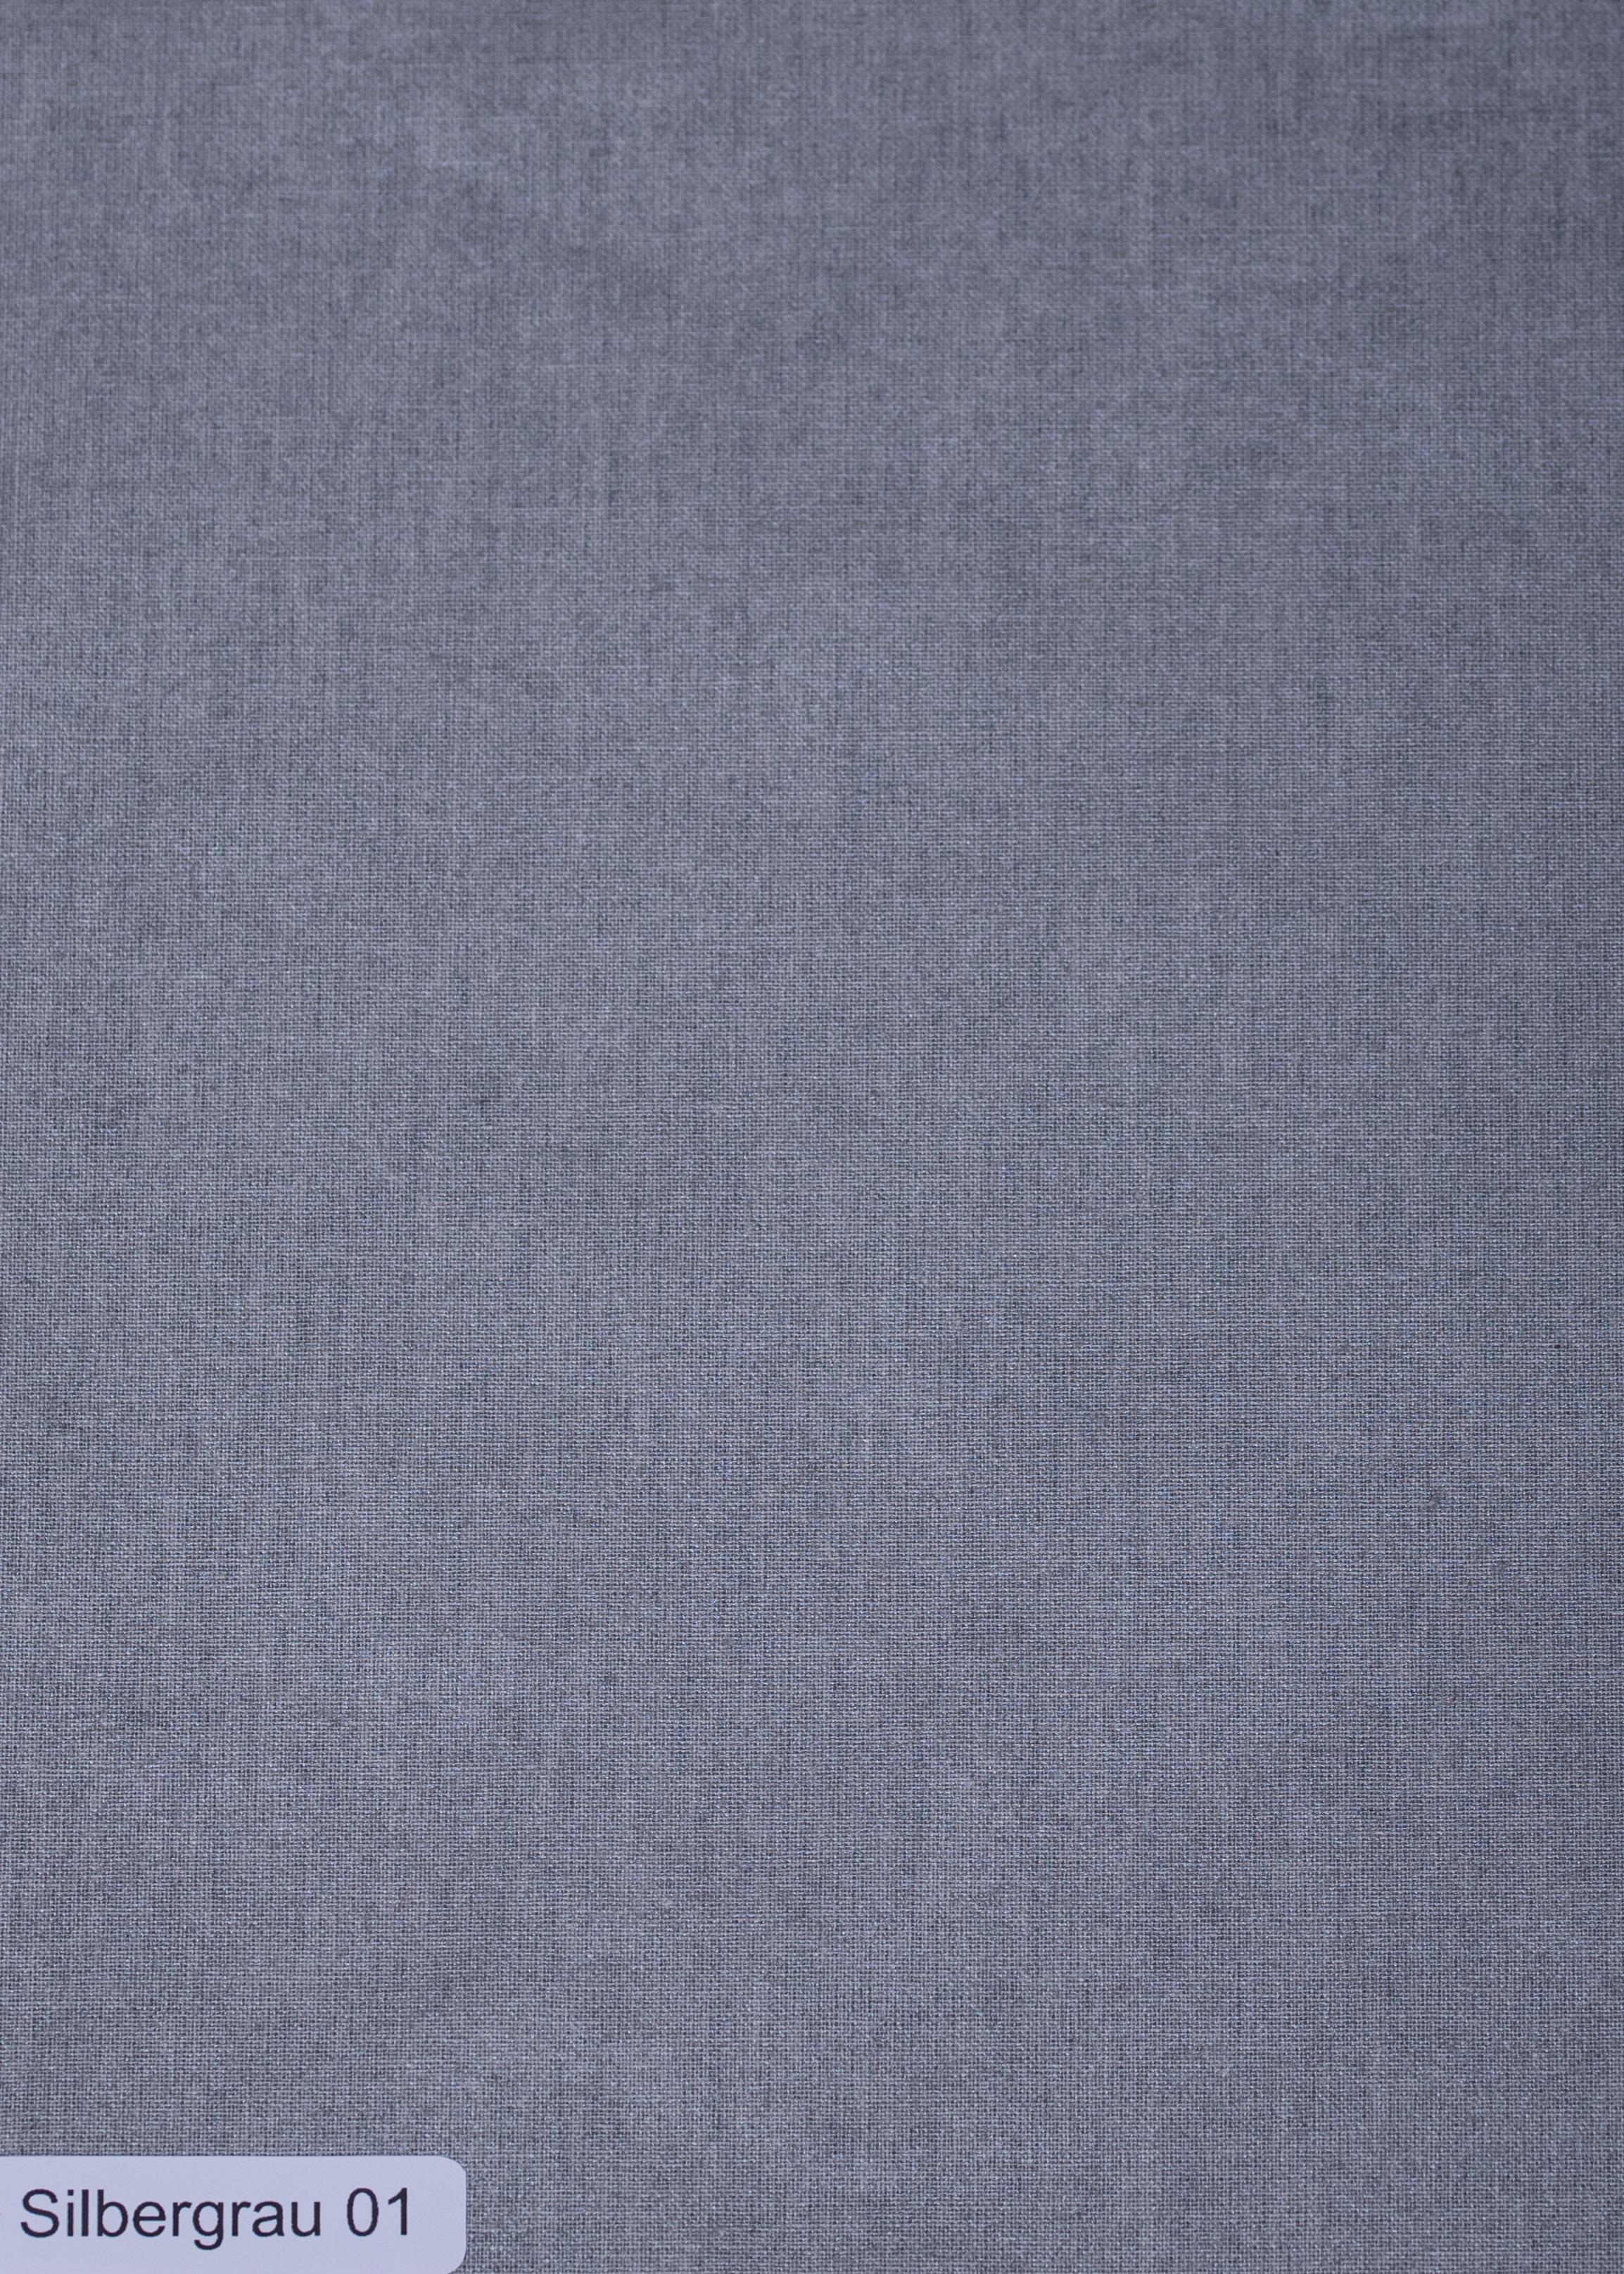 001-Silbergrau-1